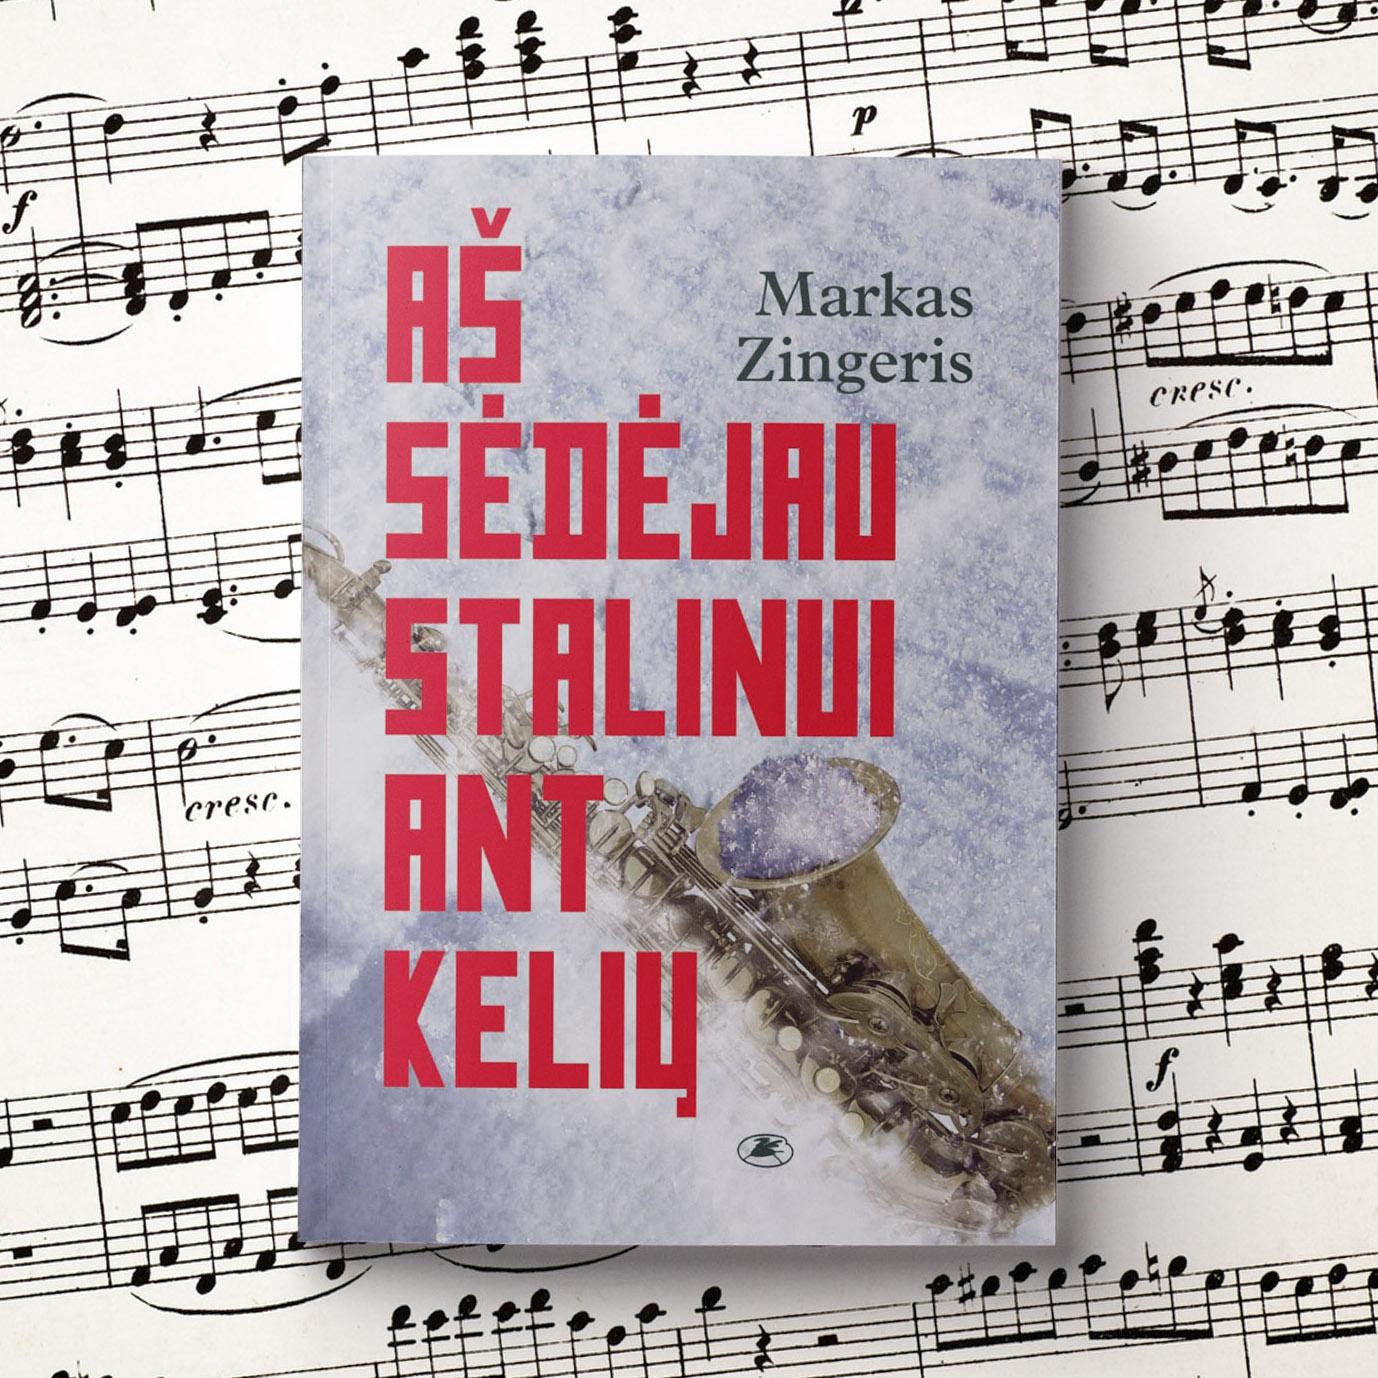 Title:  I Sat on Stalin's Lap   Author: Markas Zingeris  Year of publication: 2017  Pages: 424  Publisher: Lietuvos rašytojų sąjungos leidykla (Lithuania)  World English rights available.